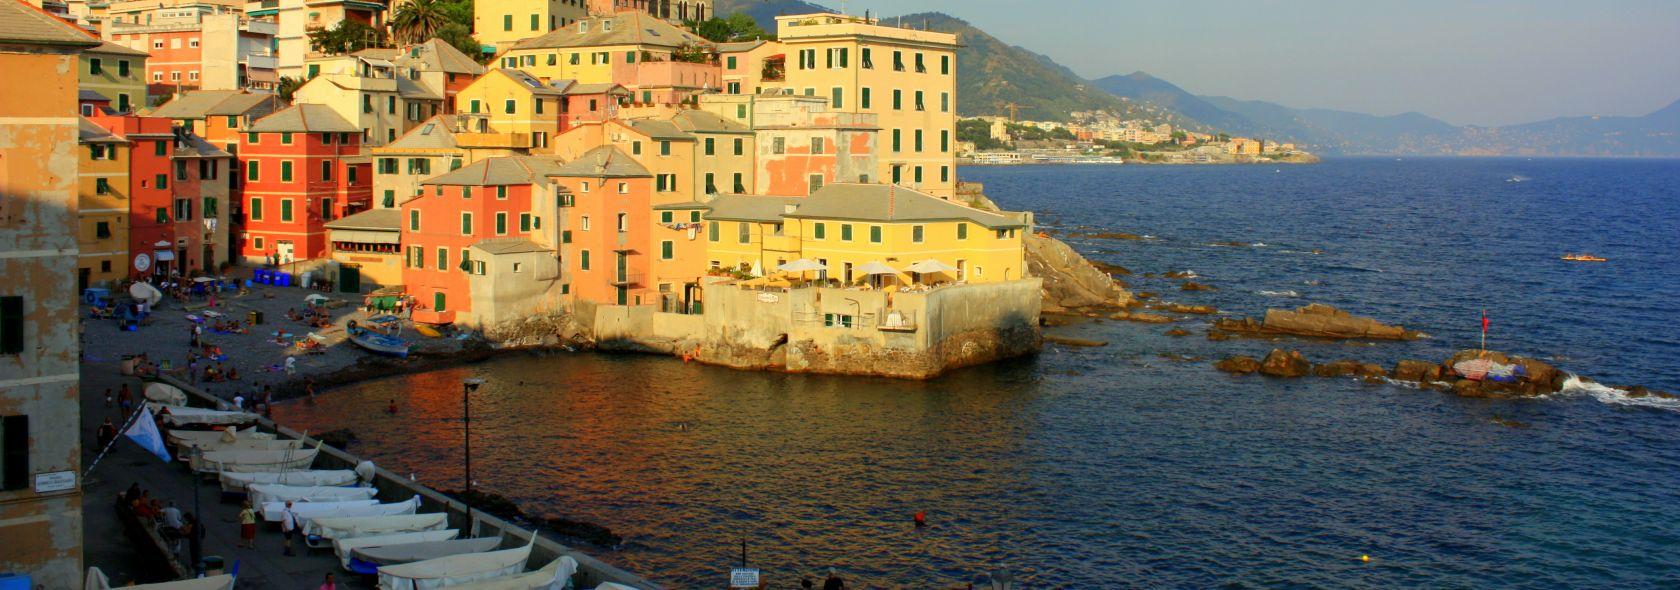 Bocadasse - Foto Ufficio Comunicazione Città Metropolitana di Genova